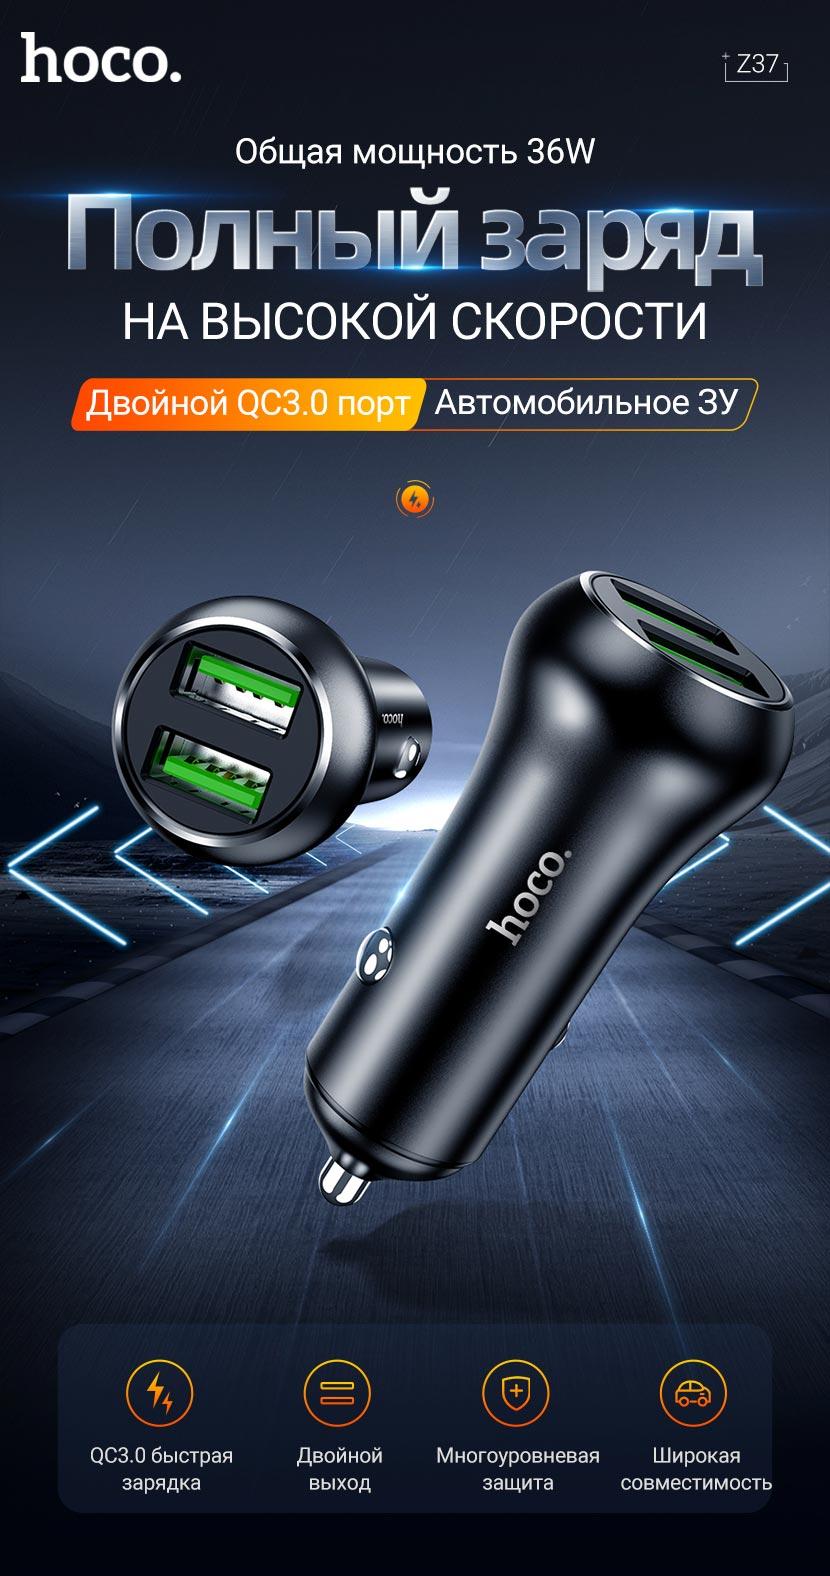 hoco news z37 sharp speed dual port qc3 car charger ru